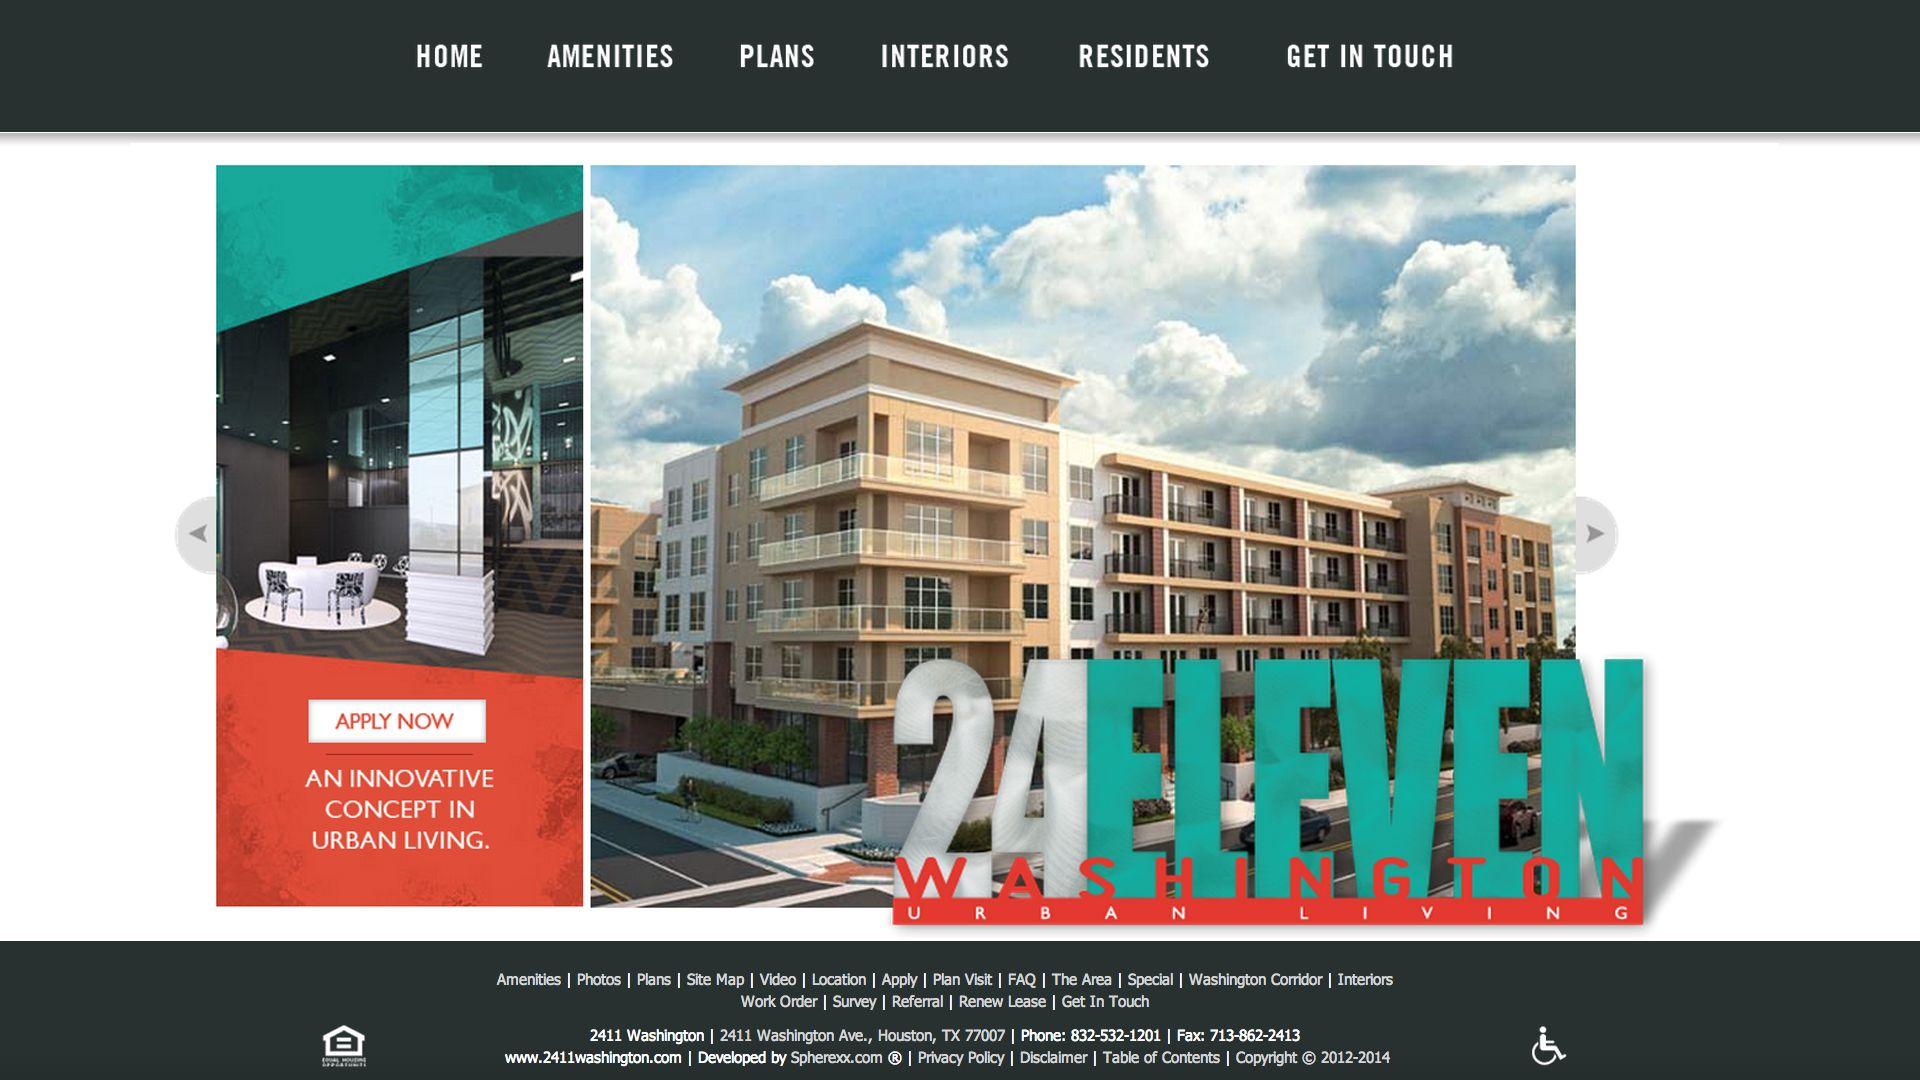 24 Eleven Washington Urban Living Http Www 2411washingtonhouston Com Resident Portal Community Activities Urban Living